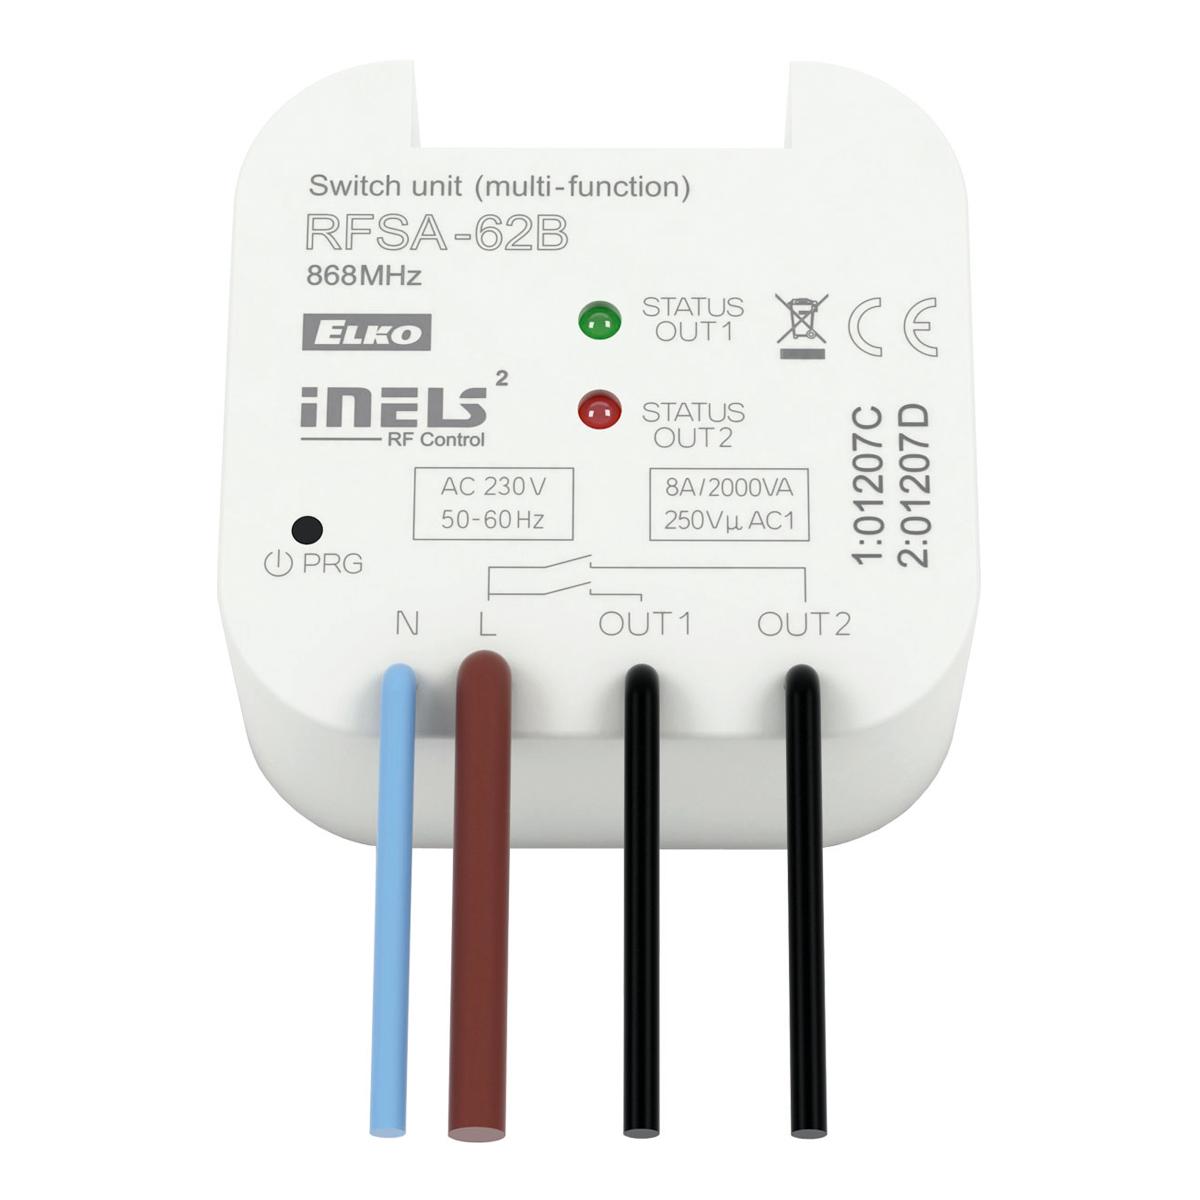 Wireless Switch Unit Inbuilt 2 Outputs Rfsa 62b Elkoep Rf Circuit Downloads